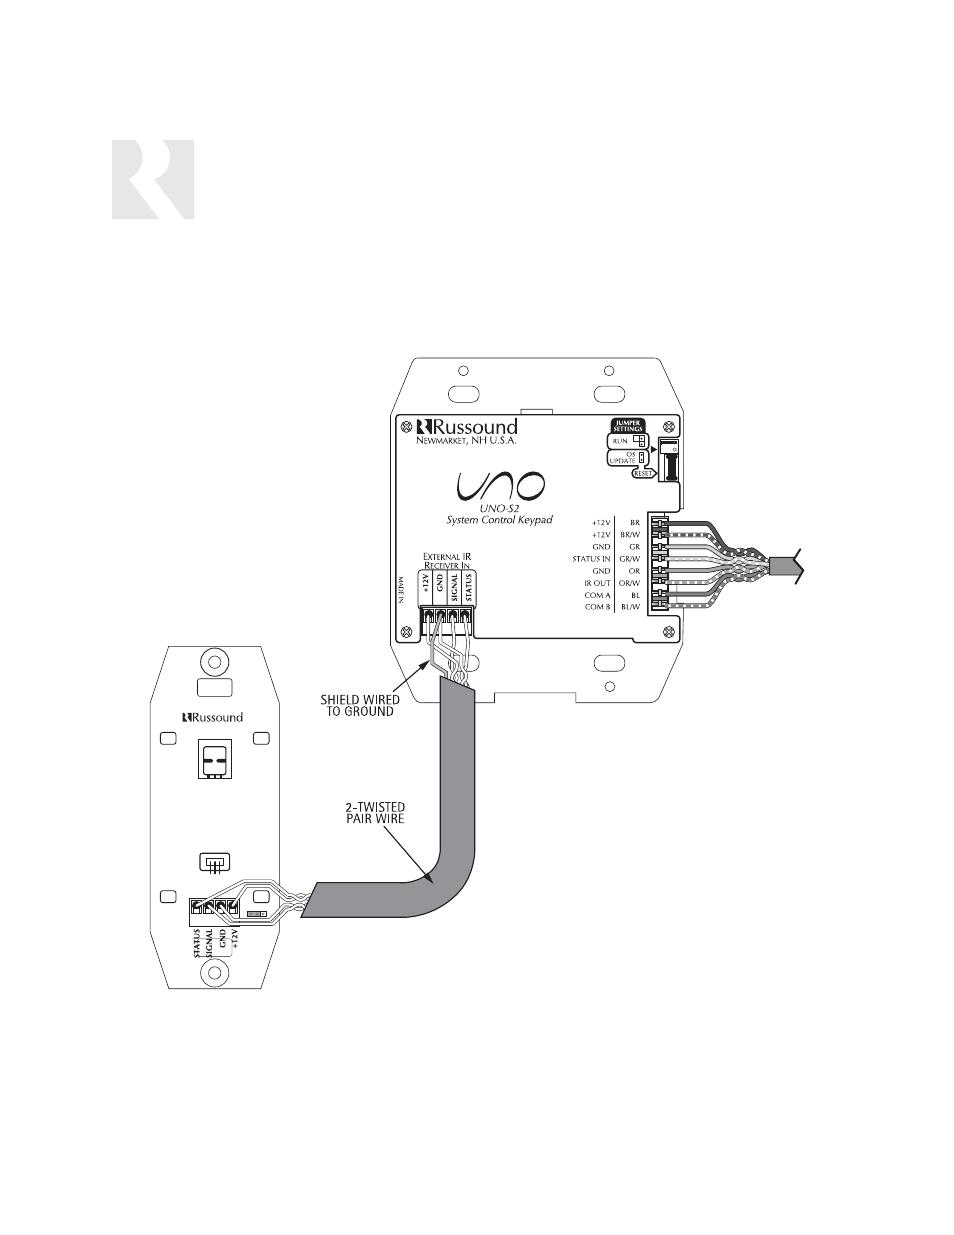 installer, uno-s2 keypad-installation, ir receiver connection | russound  cav6 6 user manual | page 26 / 116